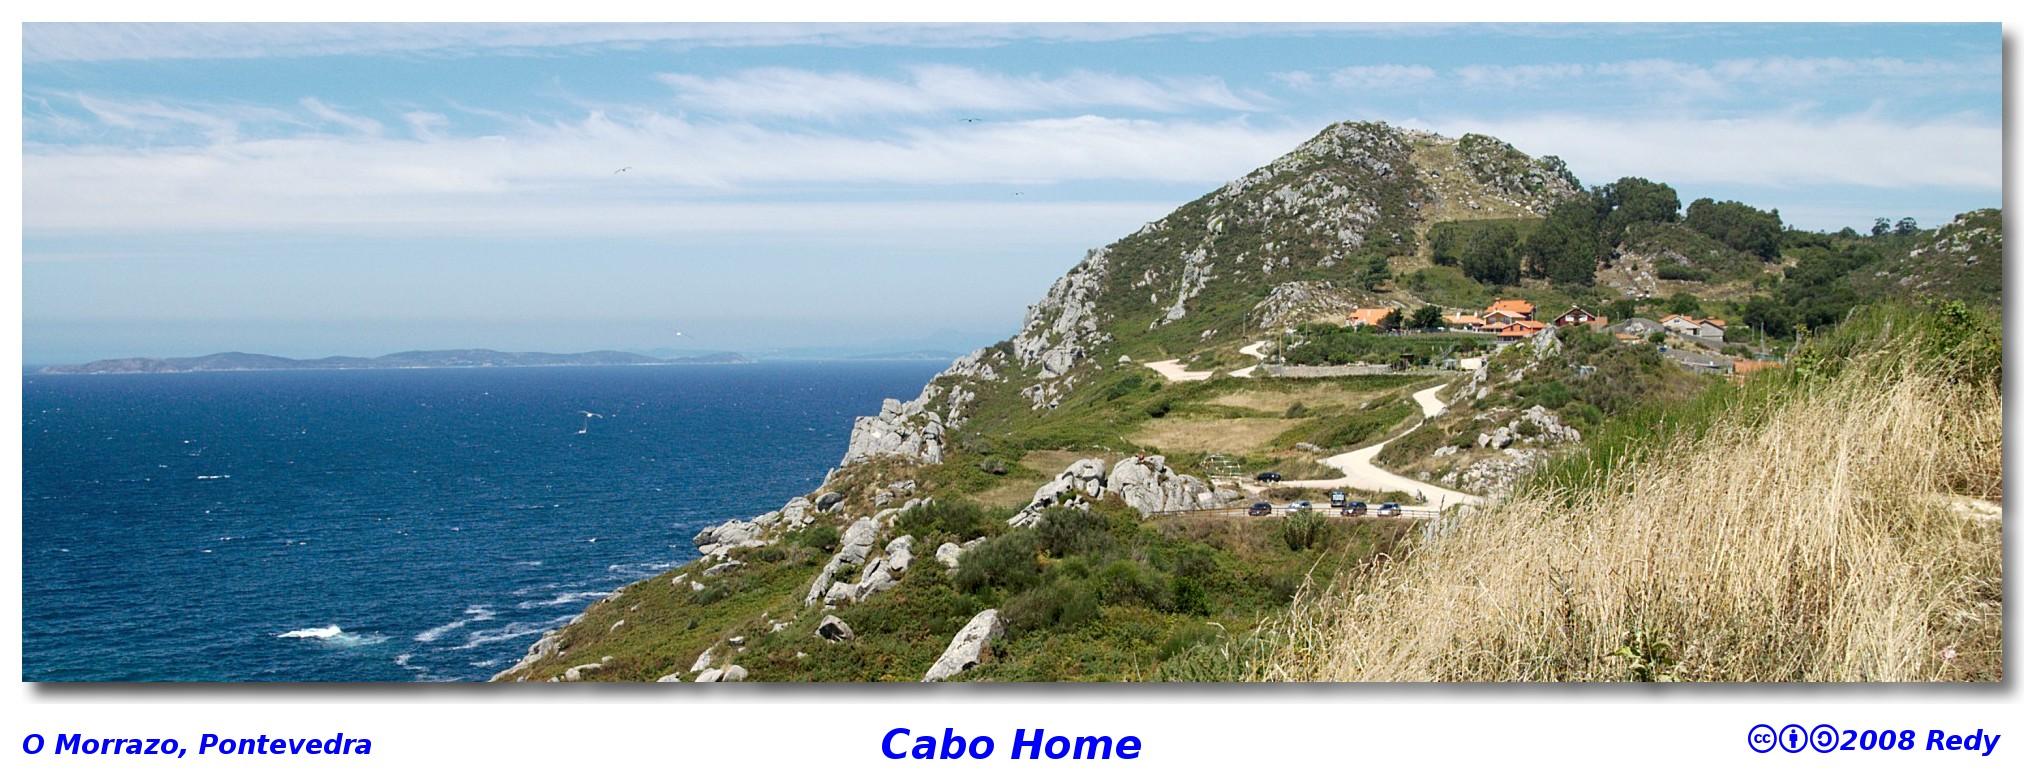 Espacio natural de Cabo Home, Morrazo, Pontevedra – Estéropes, el Cíclope